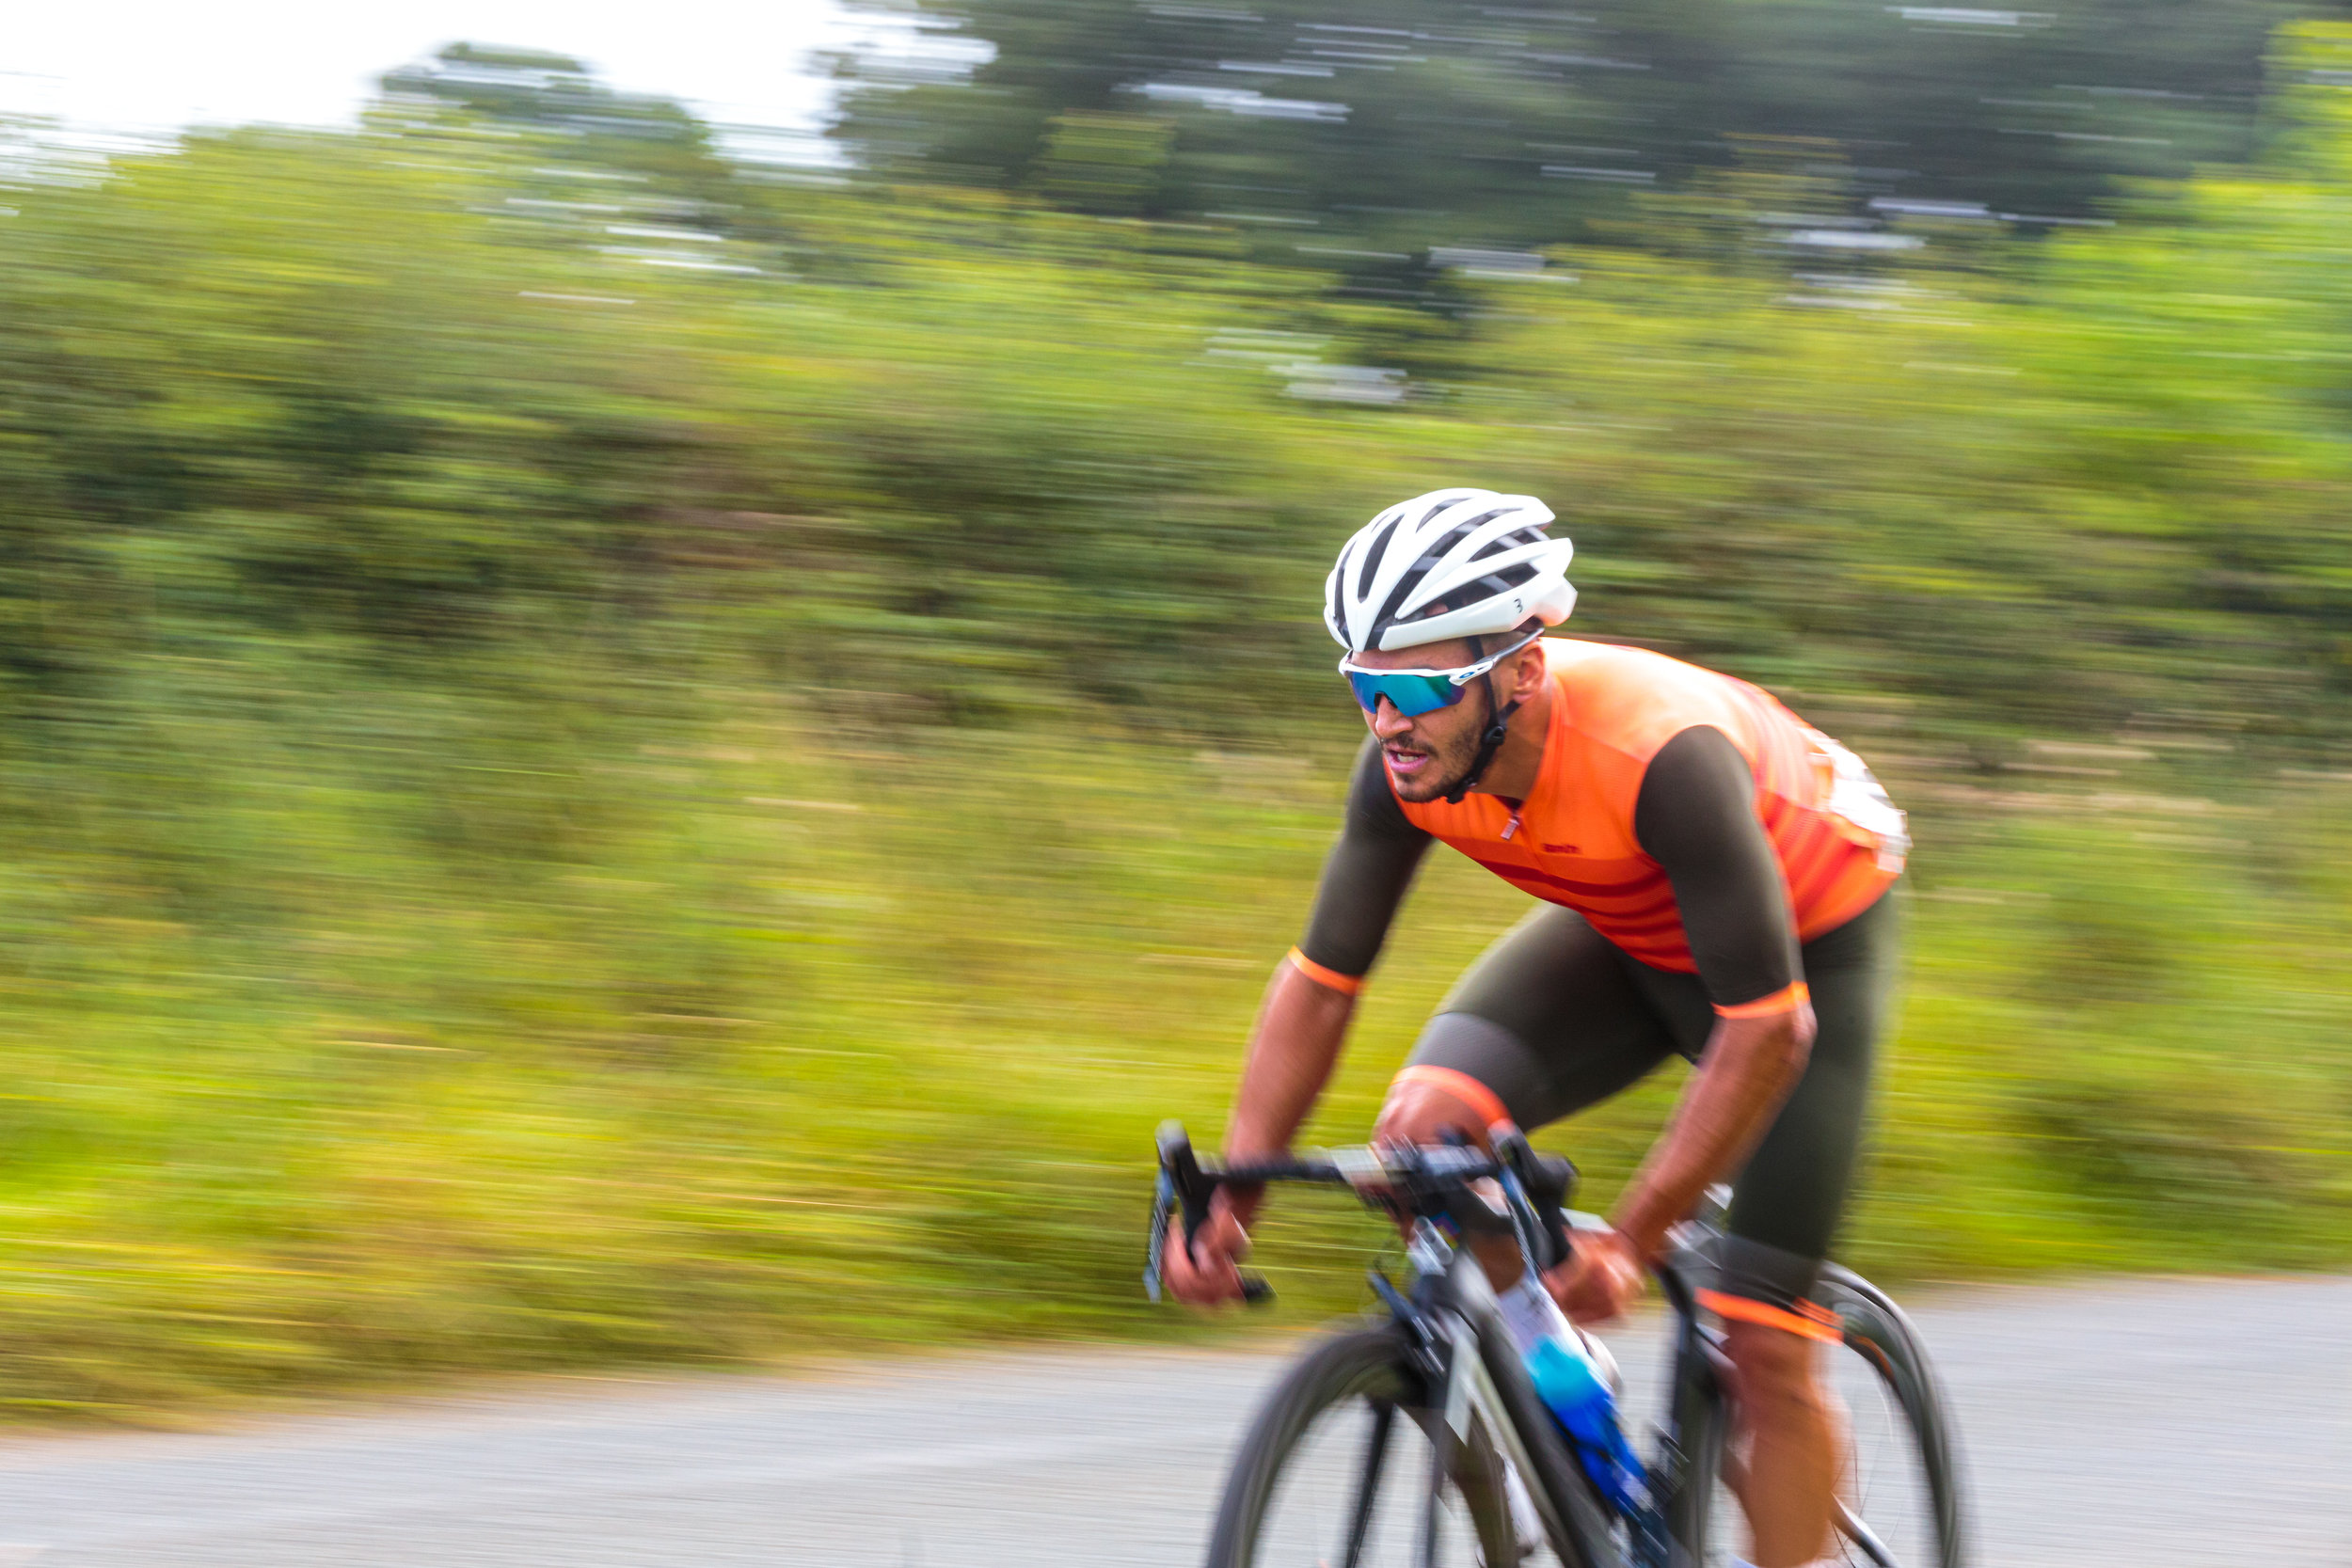 It's all a blur for Saint Piran Cyclist